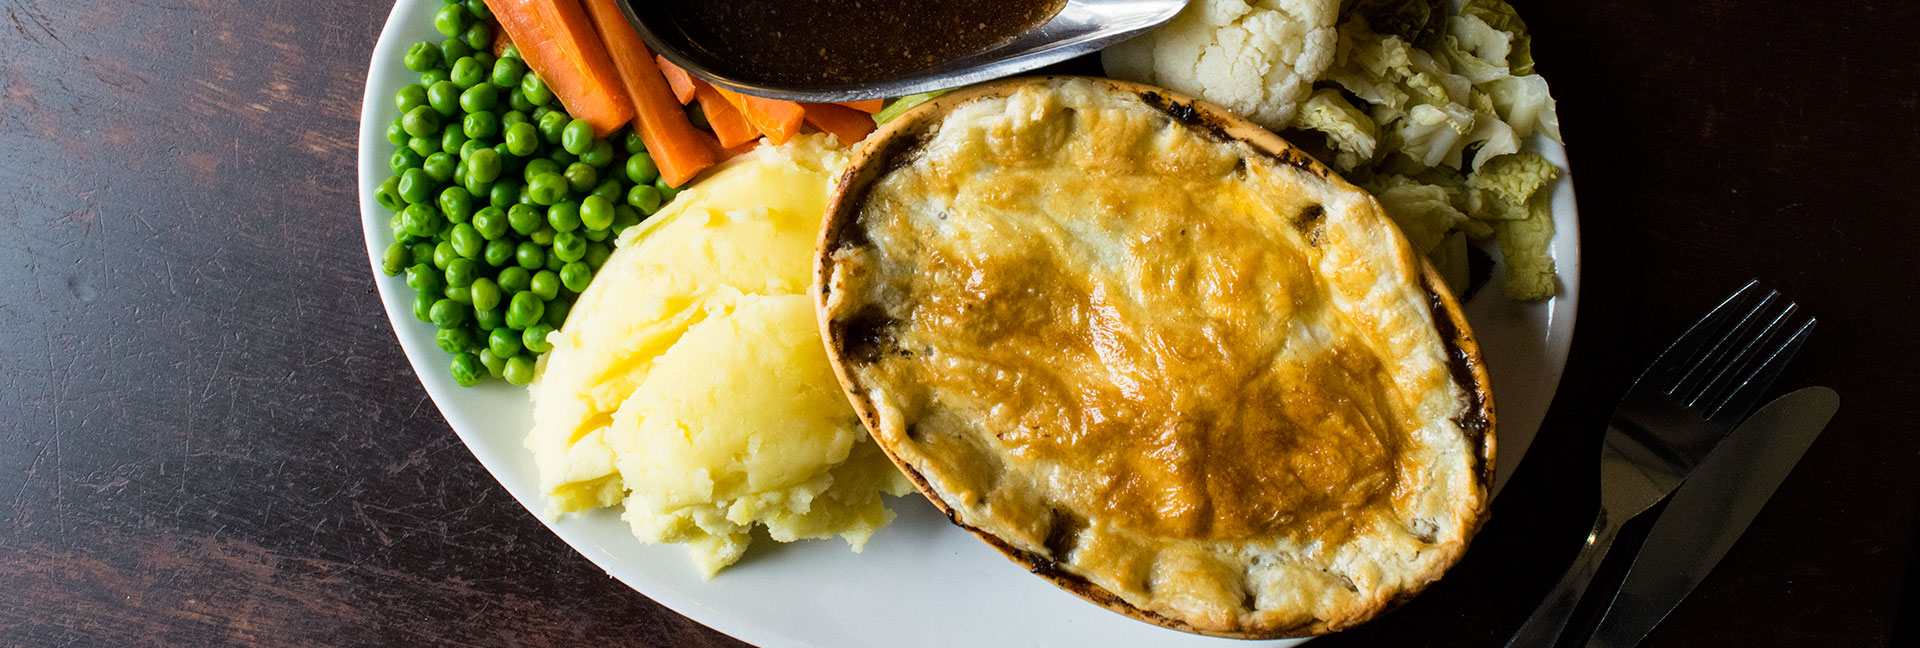 Pie Corner - The Open Hearth Restaurant